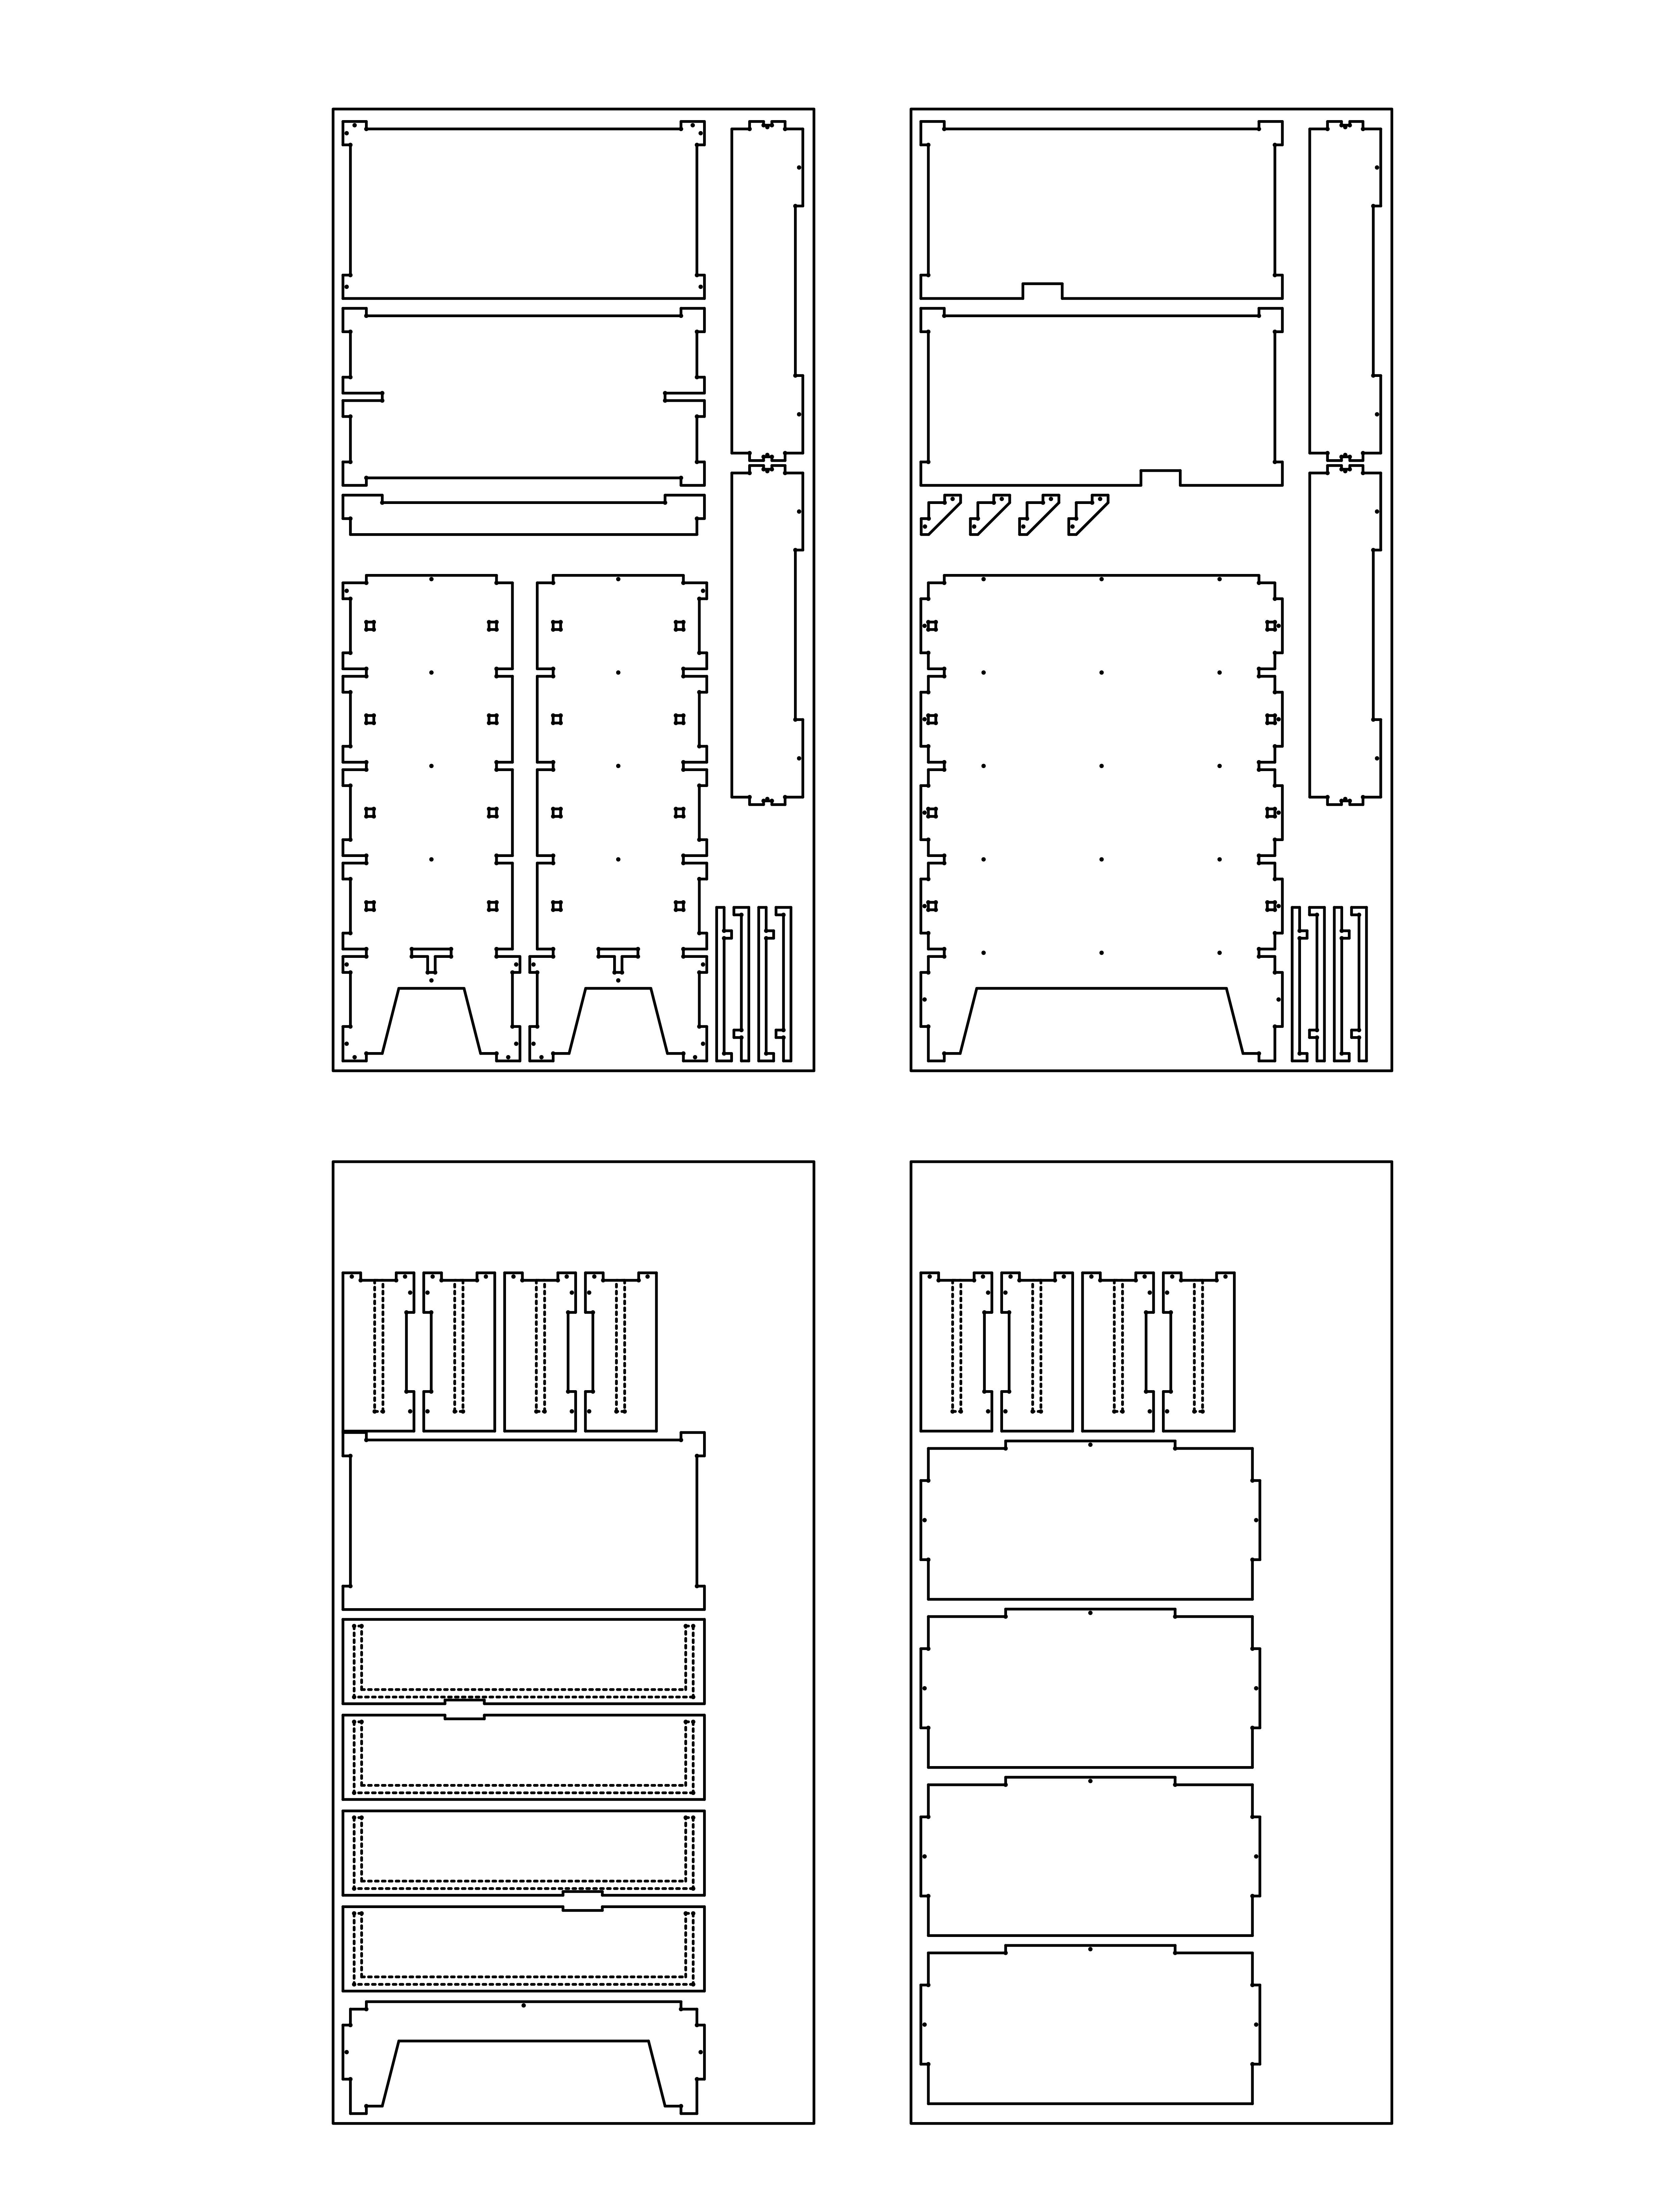 codv-06